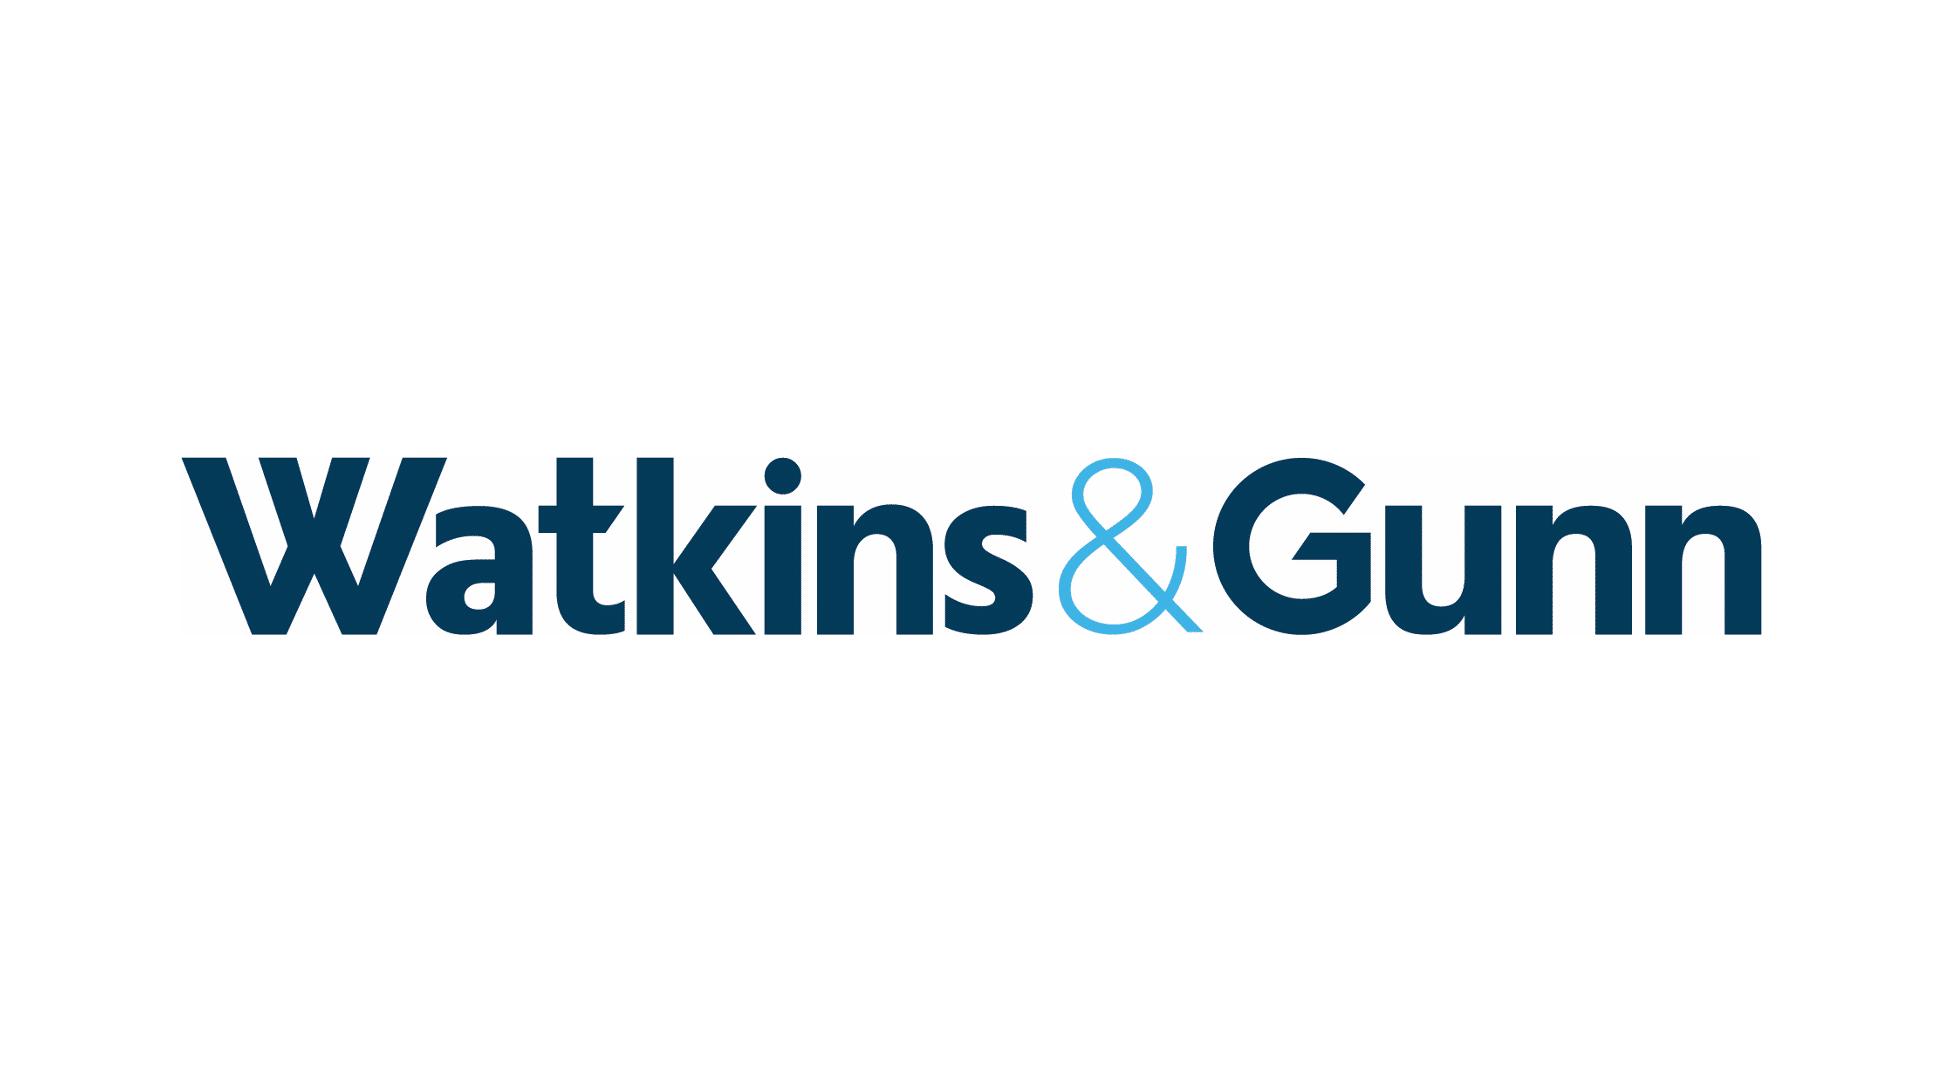 Watkins-&-Gunn-logo